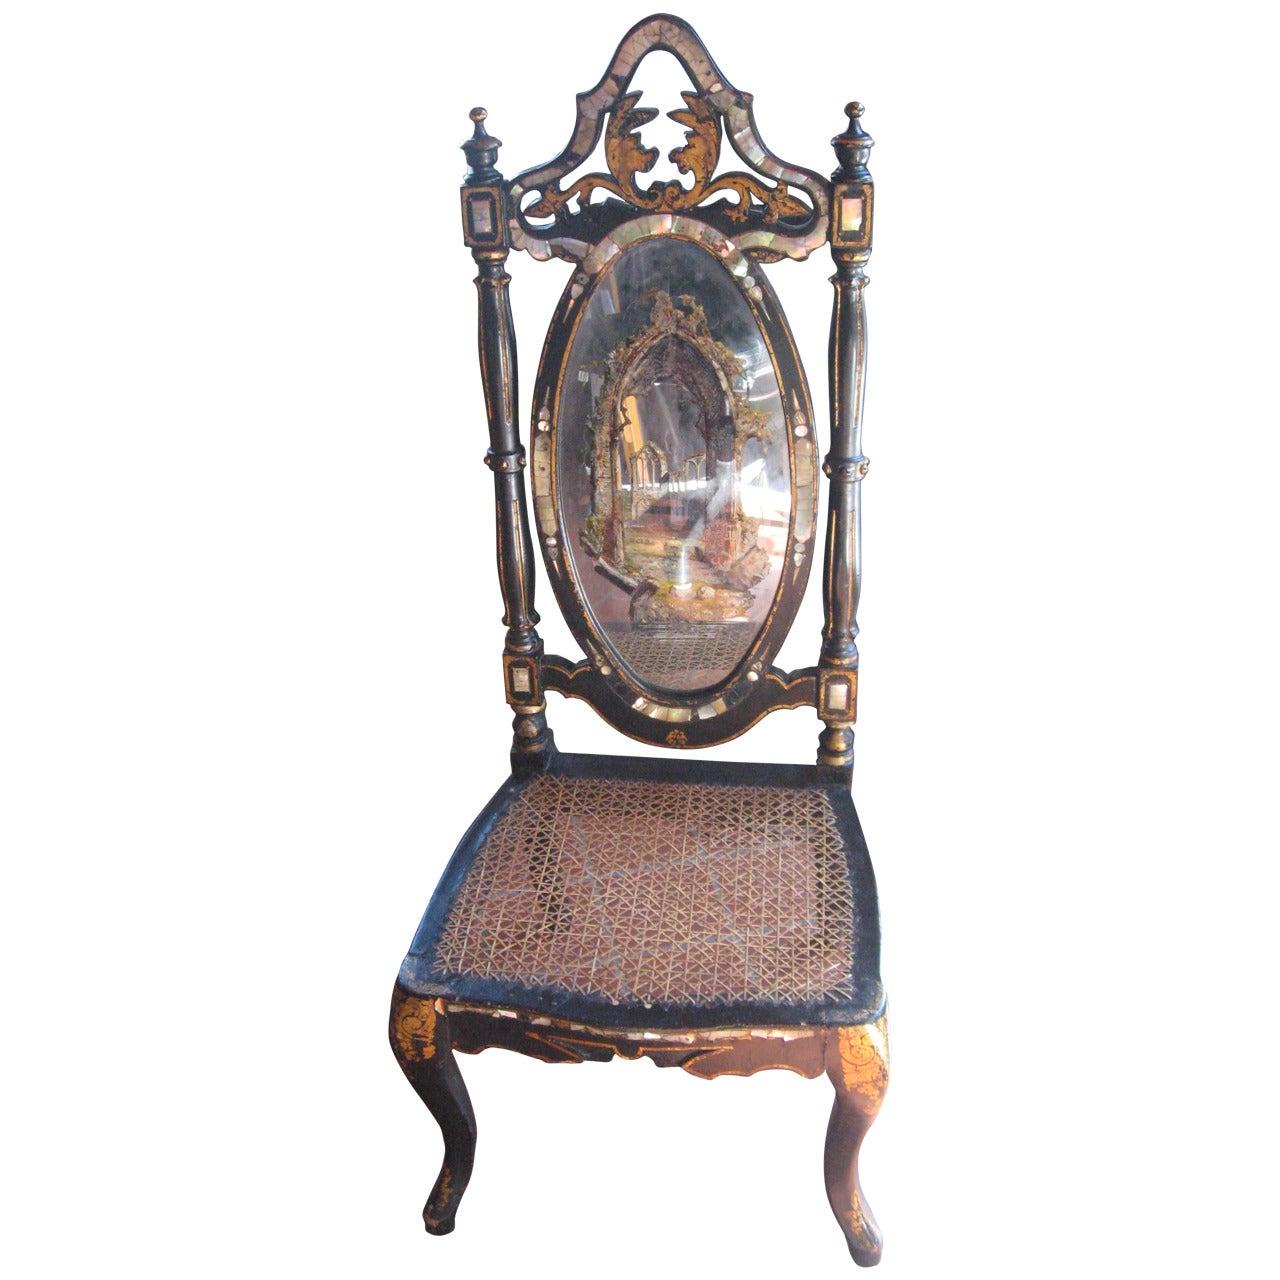 19th Century English Papier Mâché Slipper Chair